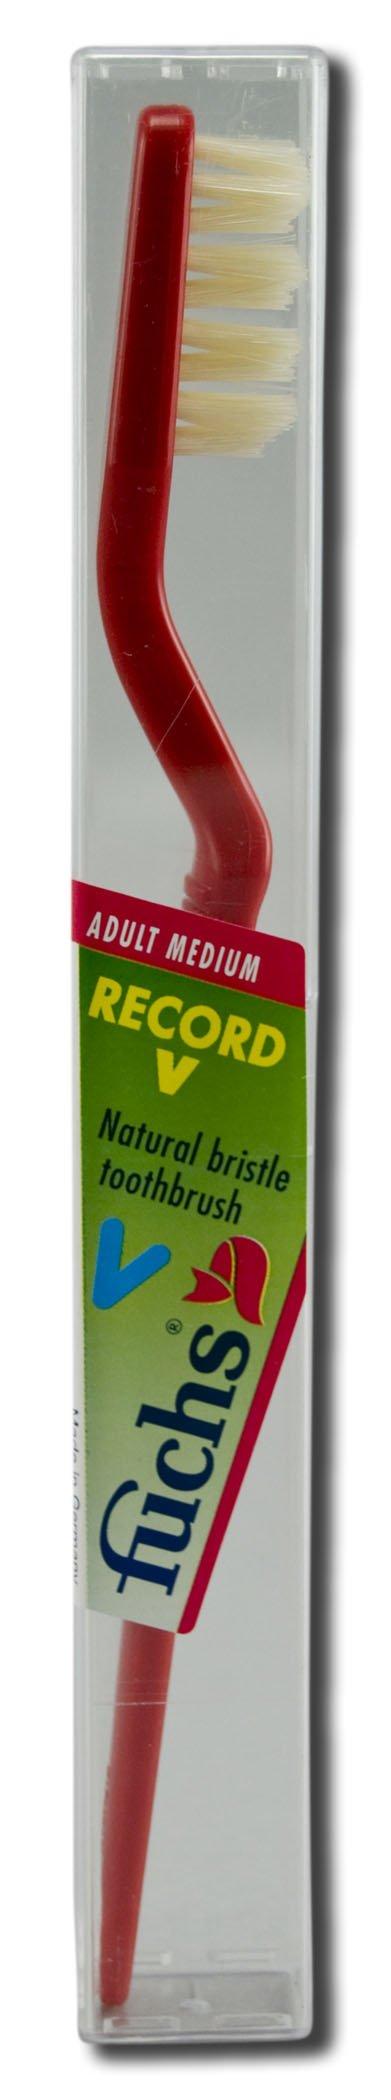 Fuchs: Pure Natural Bristle Record V Adult Medium Toothbrush, 1 ct (5 pack)